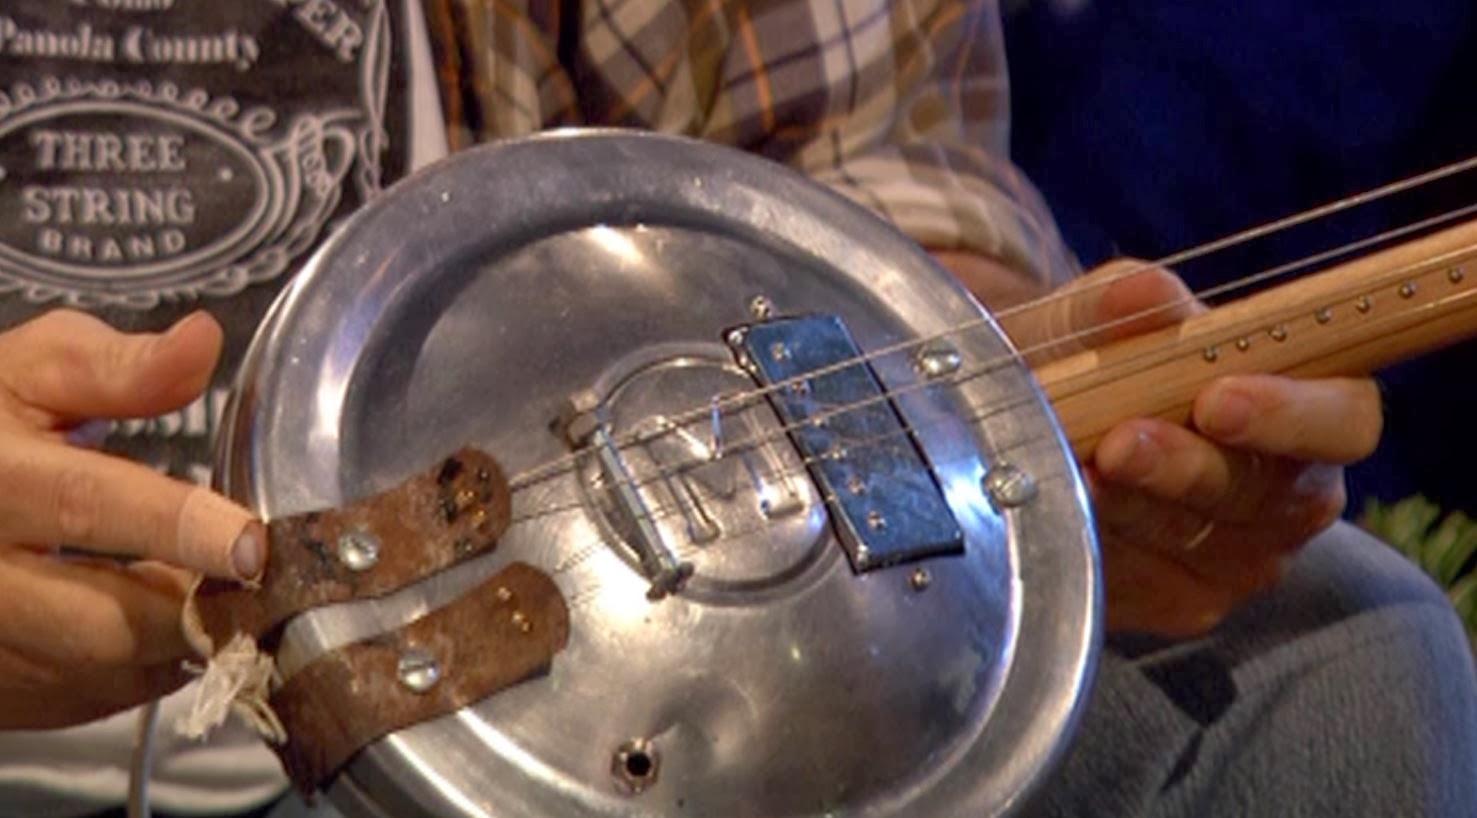 Morris Minor hubcap guitar and Seasick Steve on Top Gear, cut to